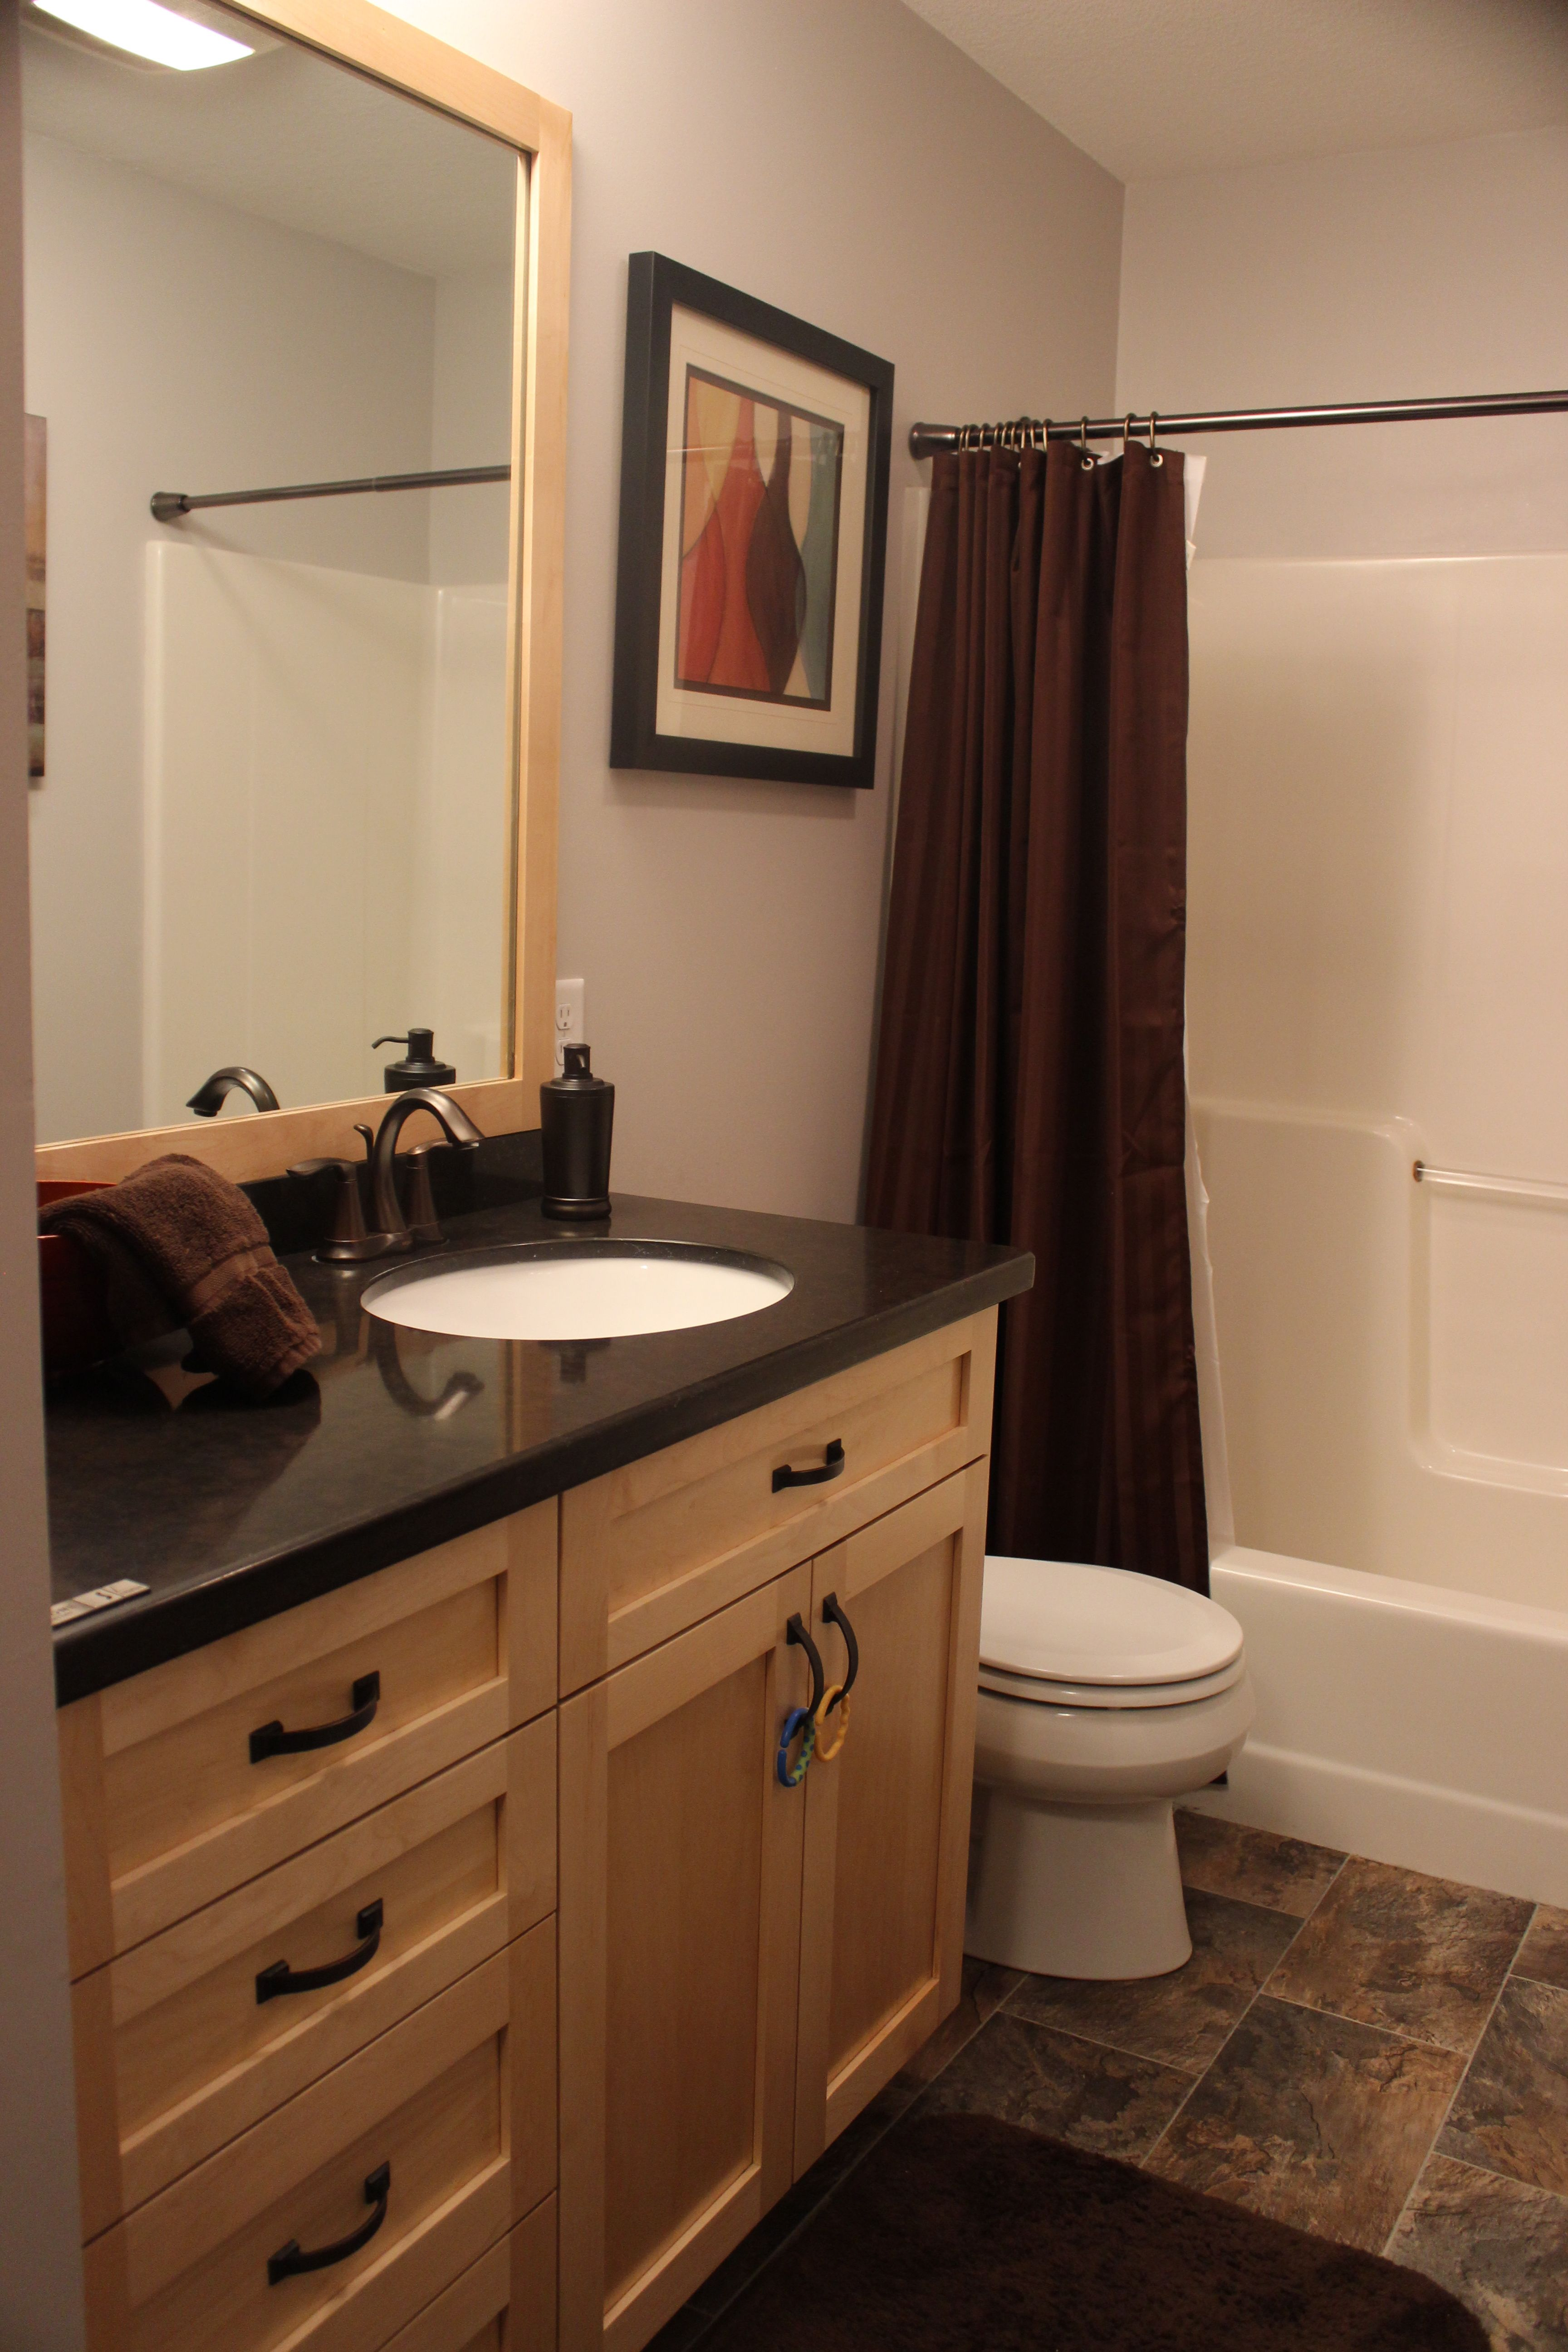 Full Bathroom-Quartz countertops, vinyl floors, maple ... on Bathroom Ideas With Maple Cabinets  id=30616